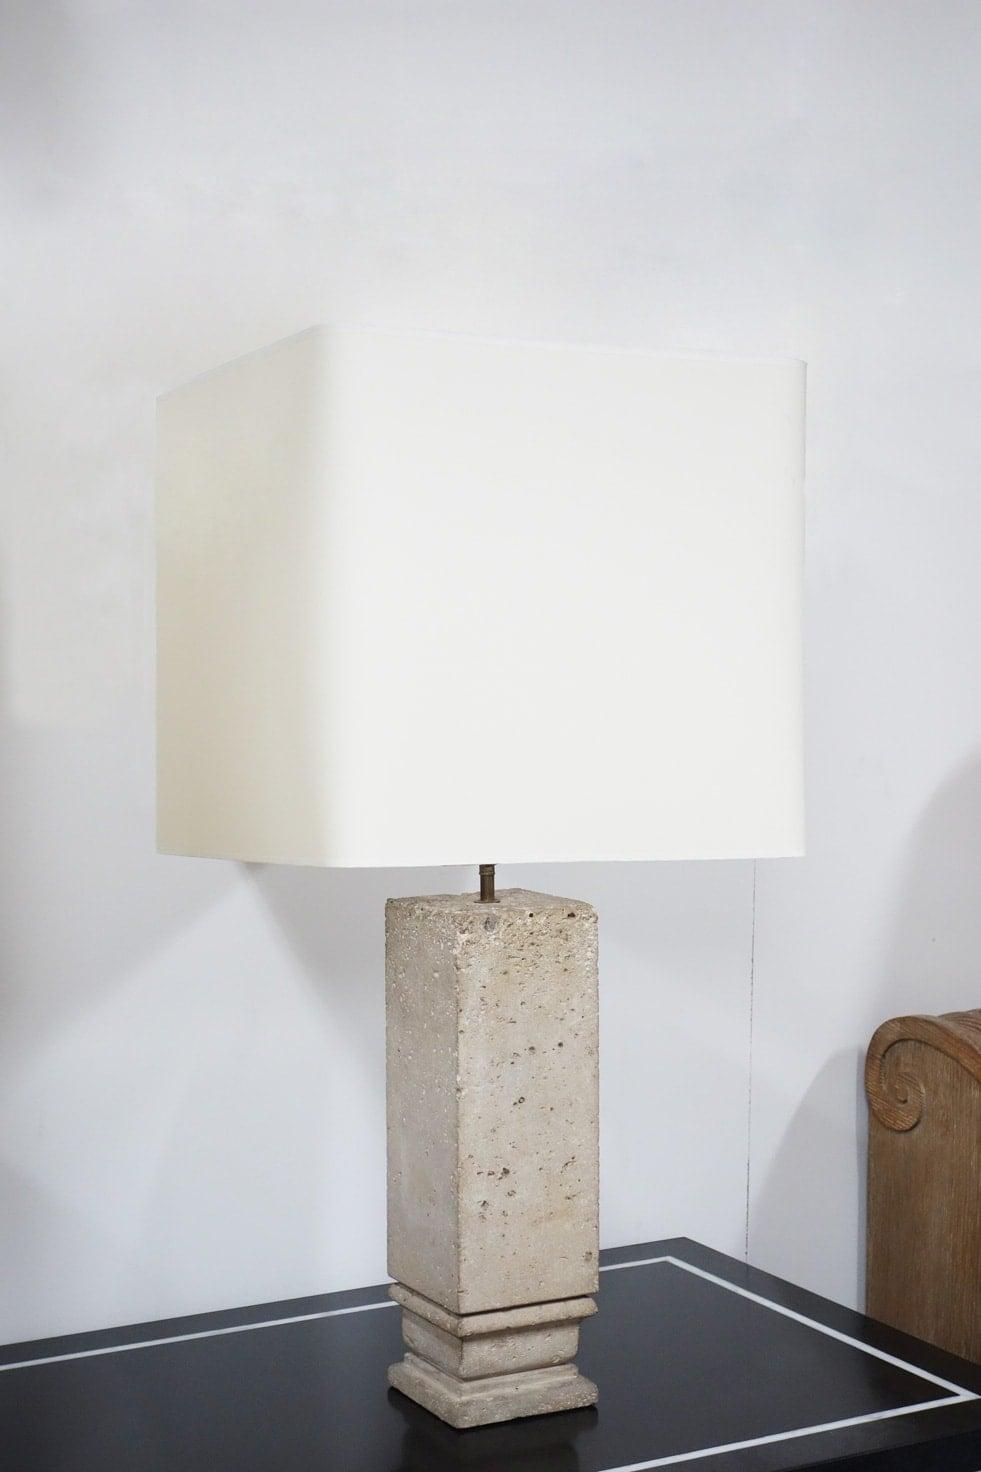 Jean-Charles Moreux, Pair of lamps, vue 03